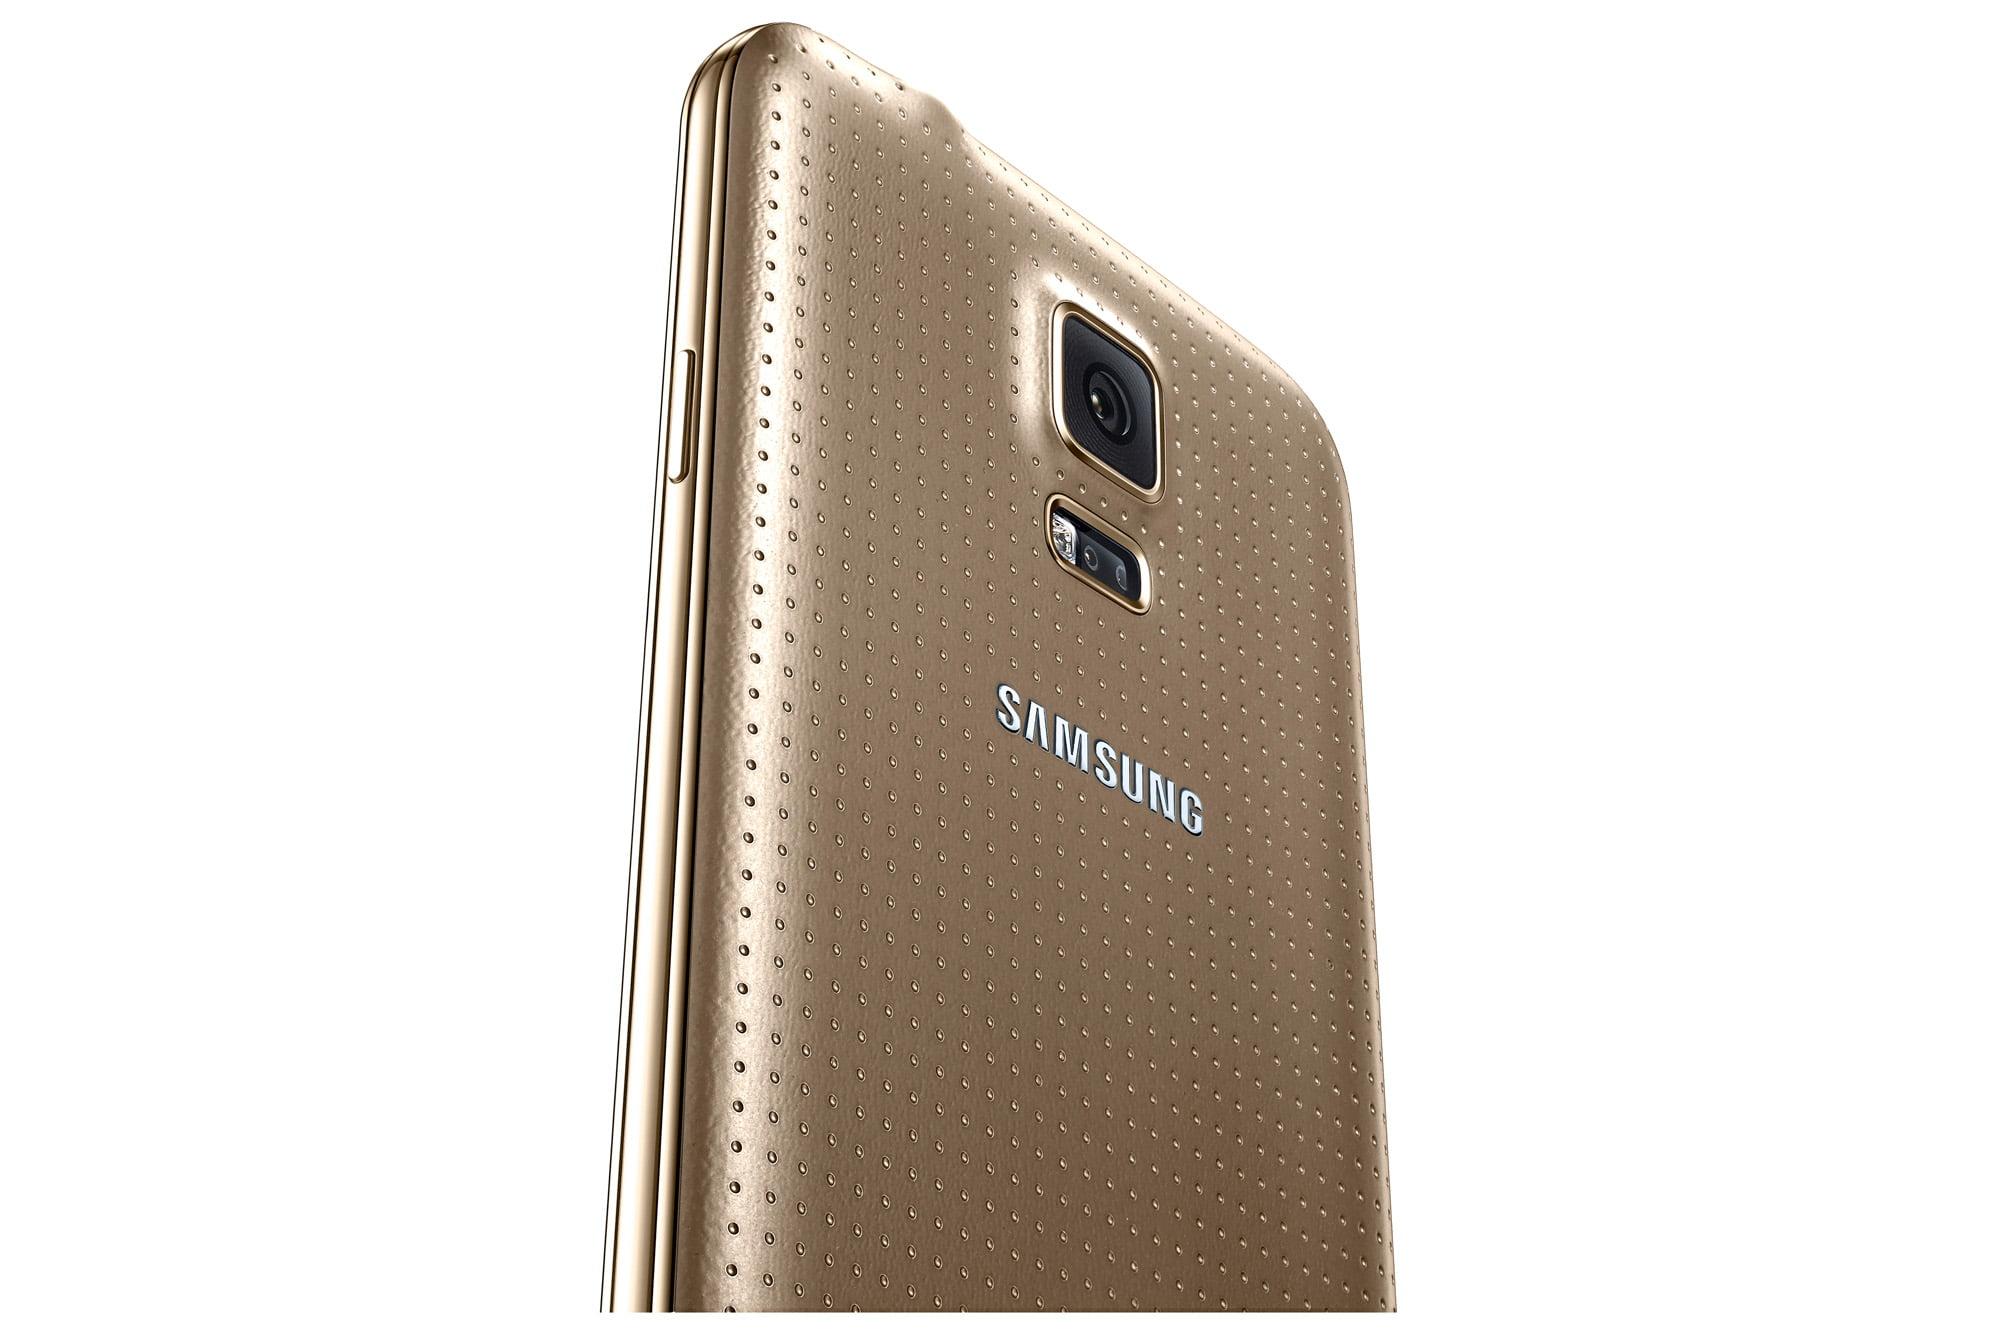 S5 Copper Gold - Back